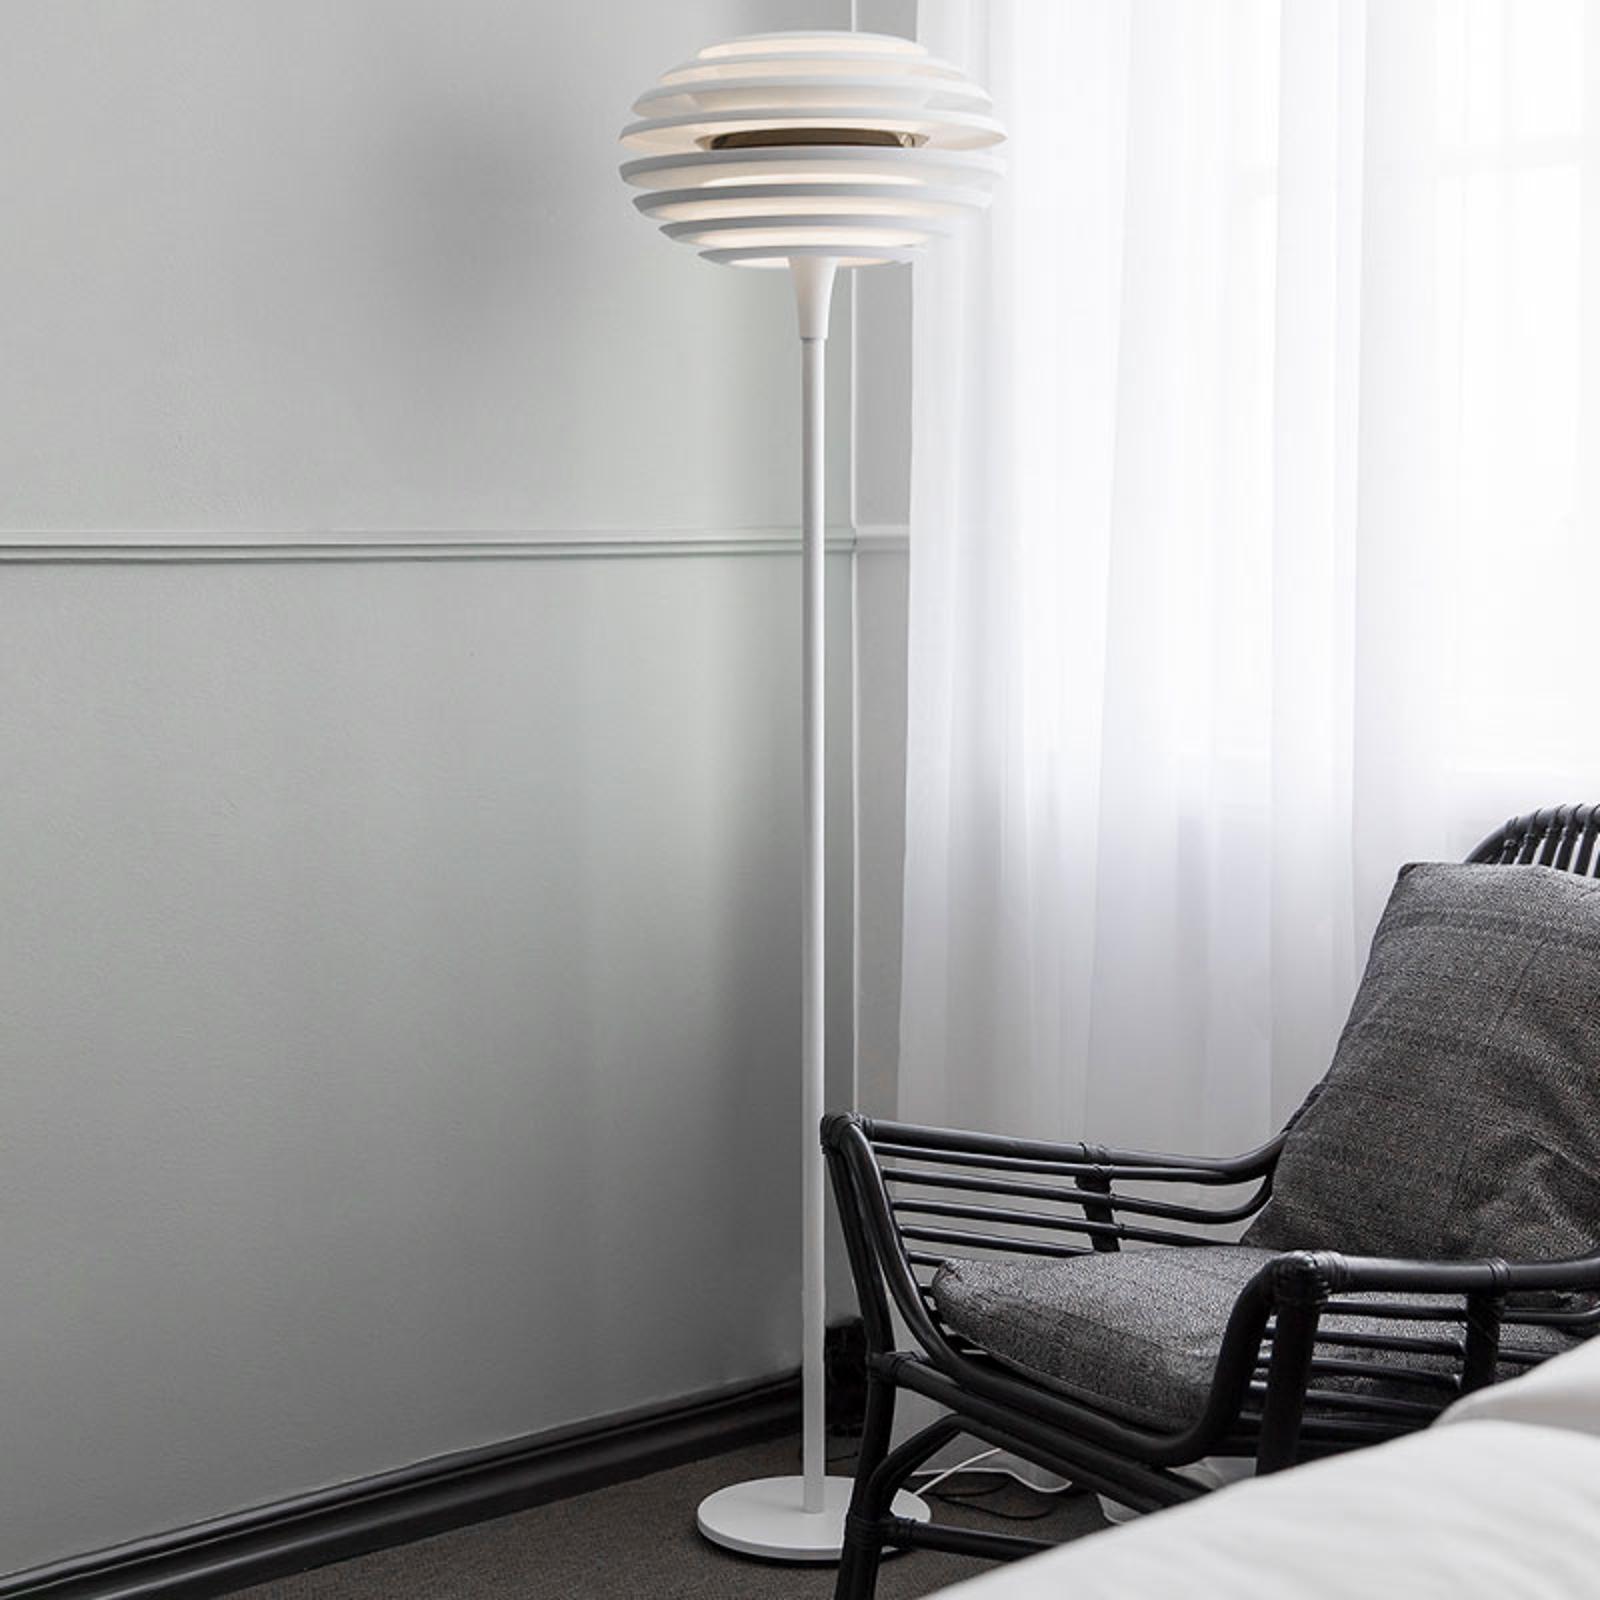 Vloerlamp Ellipse met dimmer, wit/chroom